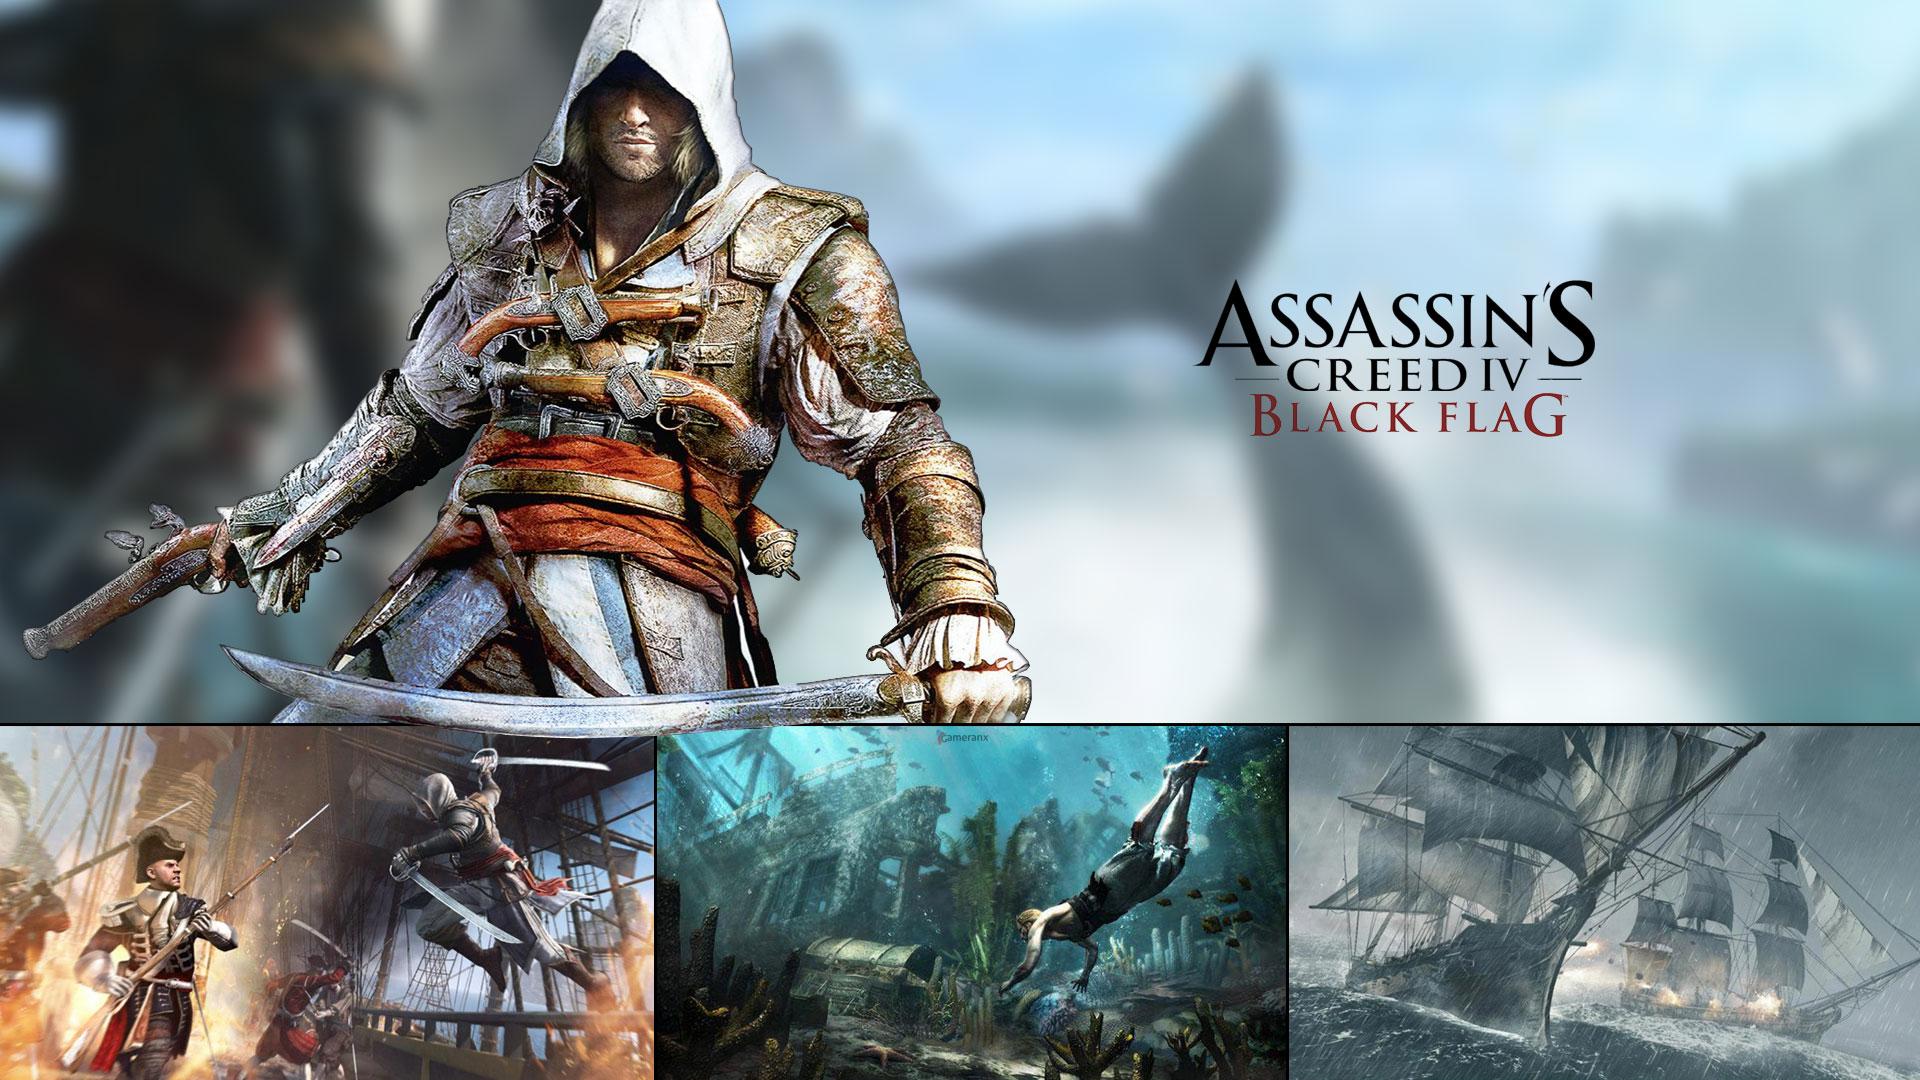 Assassins Creed Wallpaper 1080p: Assassin's Creed HD Wallpapers 1080p